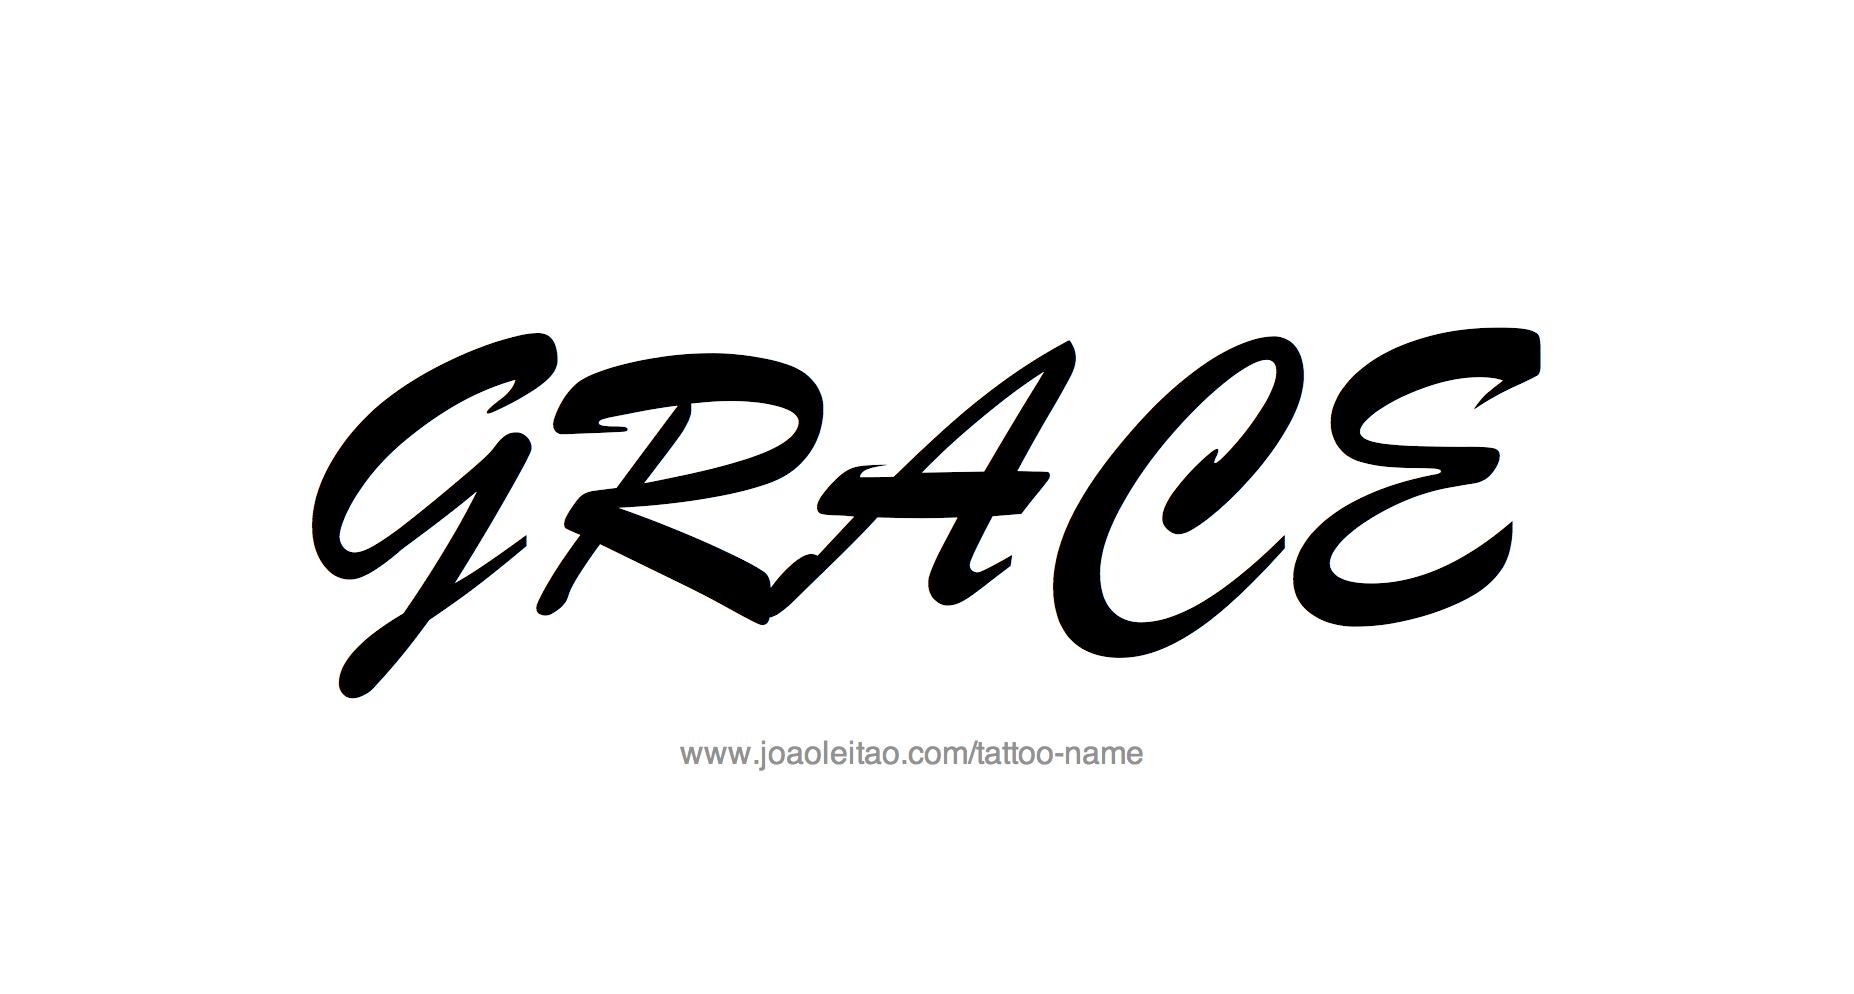 Grace name tattoo designs tattoo design name grace biocorpaavc Images